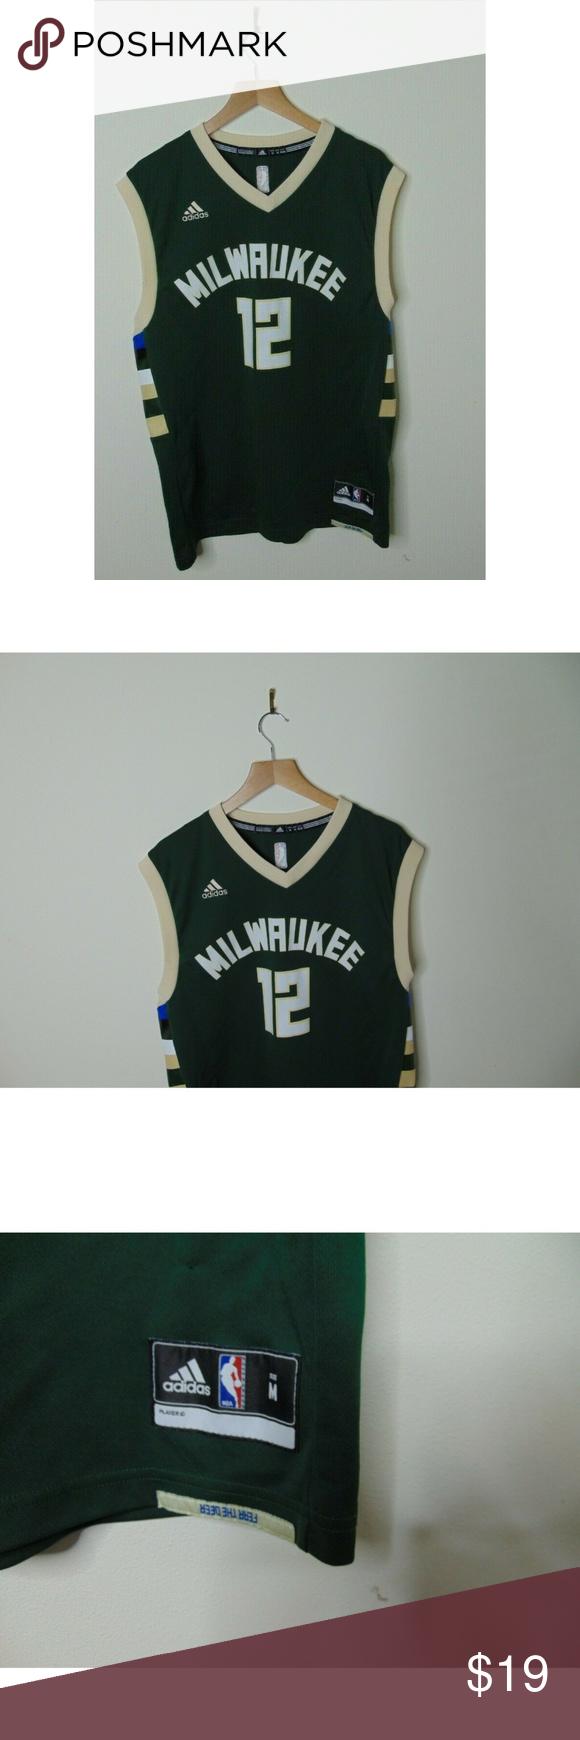 b8b1be99138 Adidas M Jabari Parker Basketball Jersey NBA Adidas Men M Jabari Parker  Basketball Jersey Milwaukee Bucks